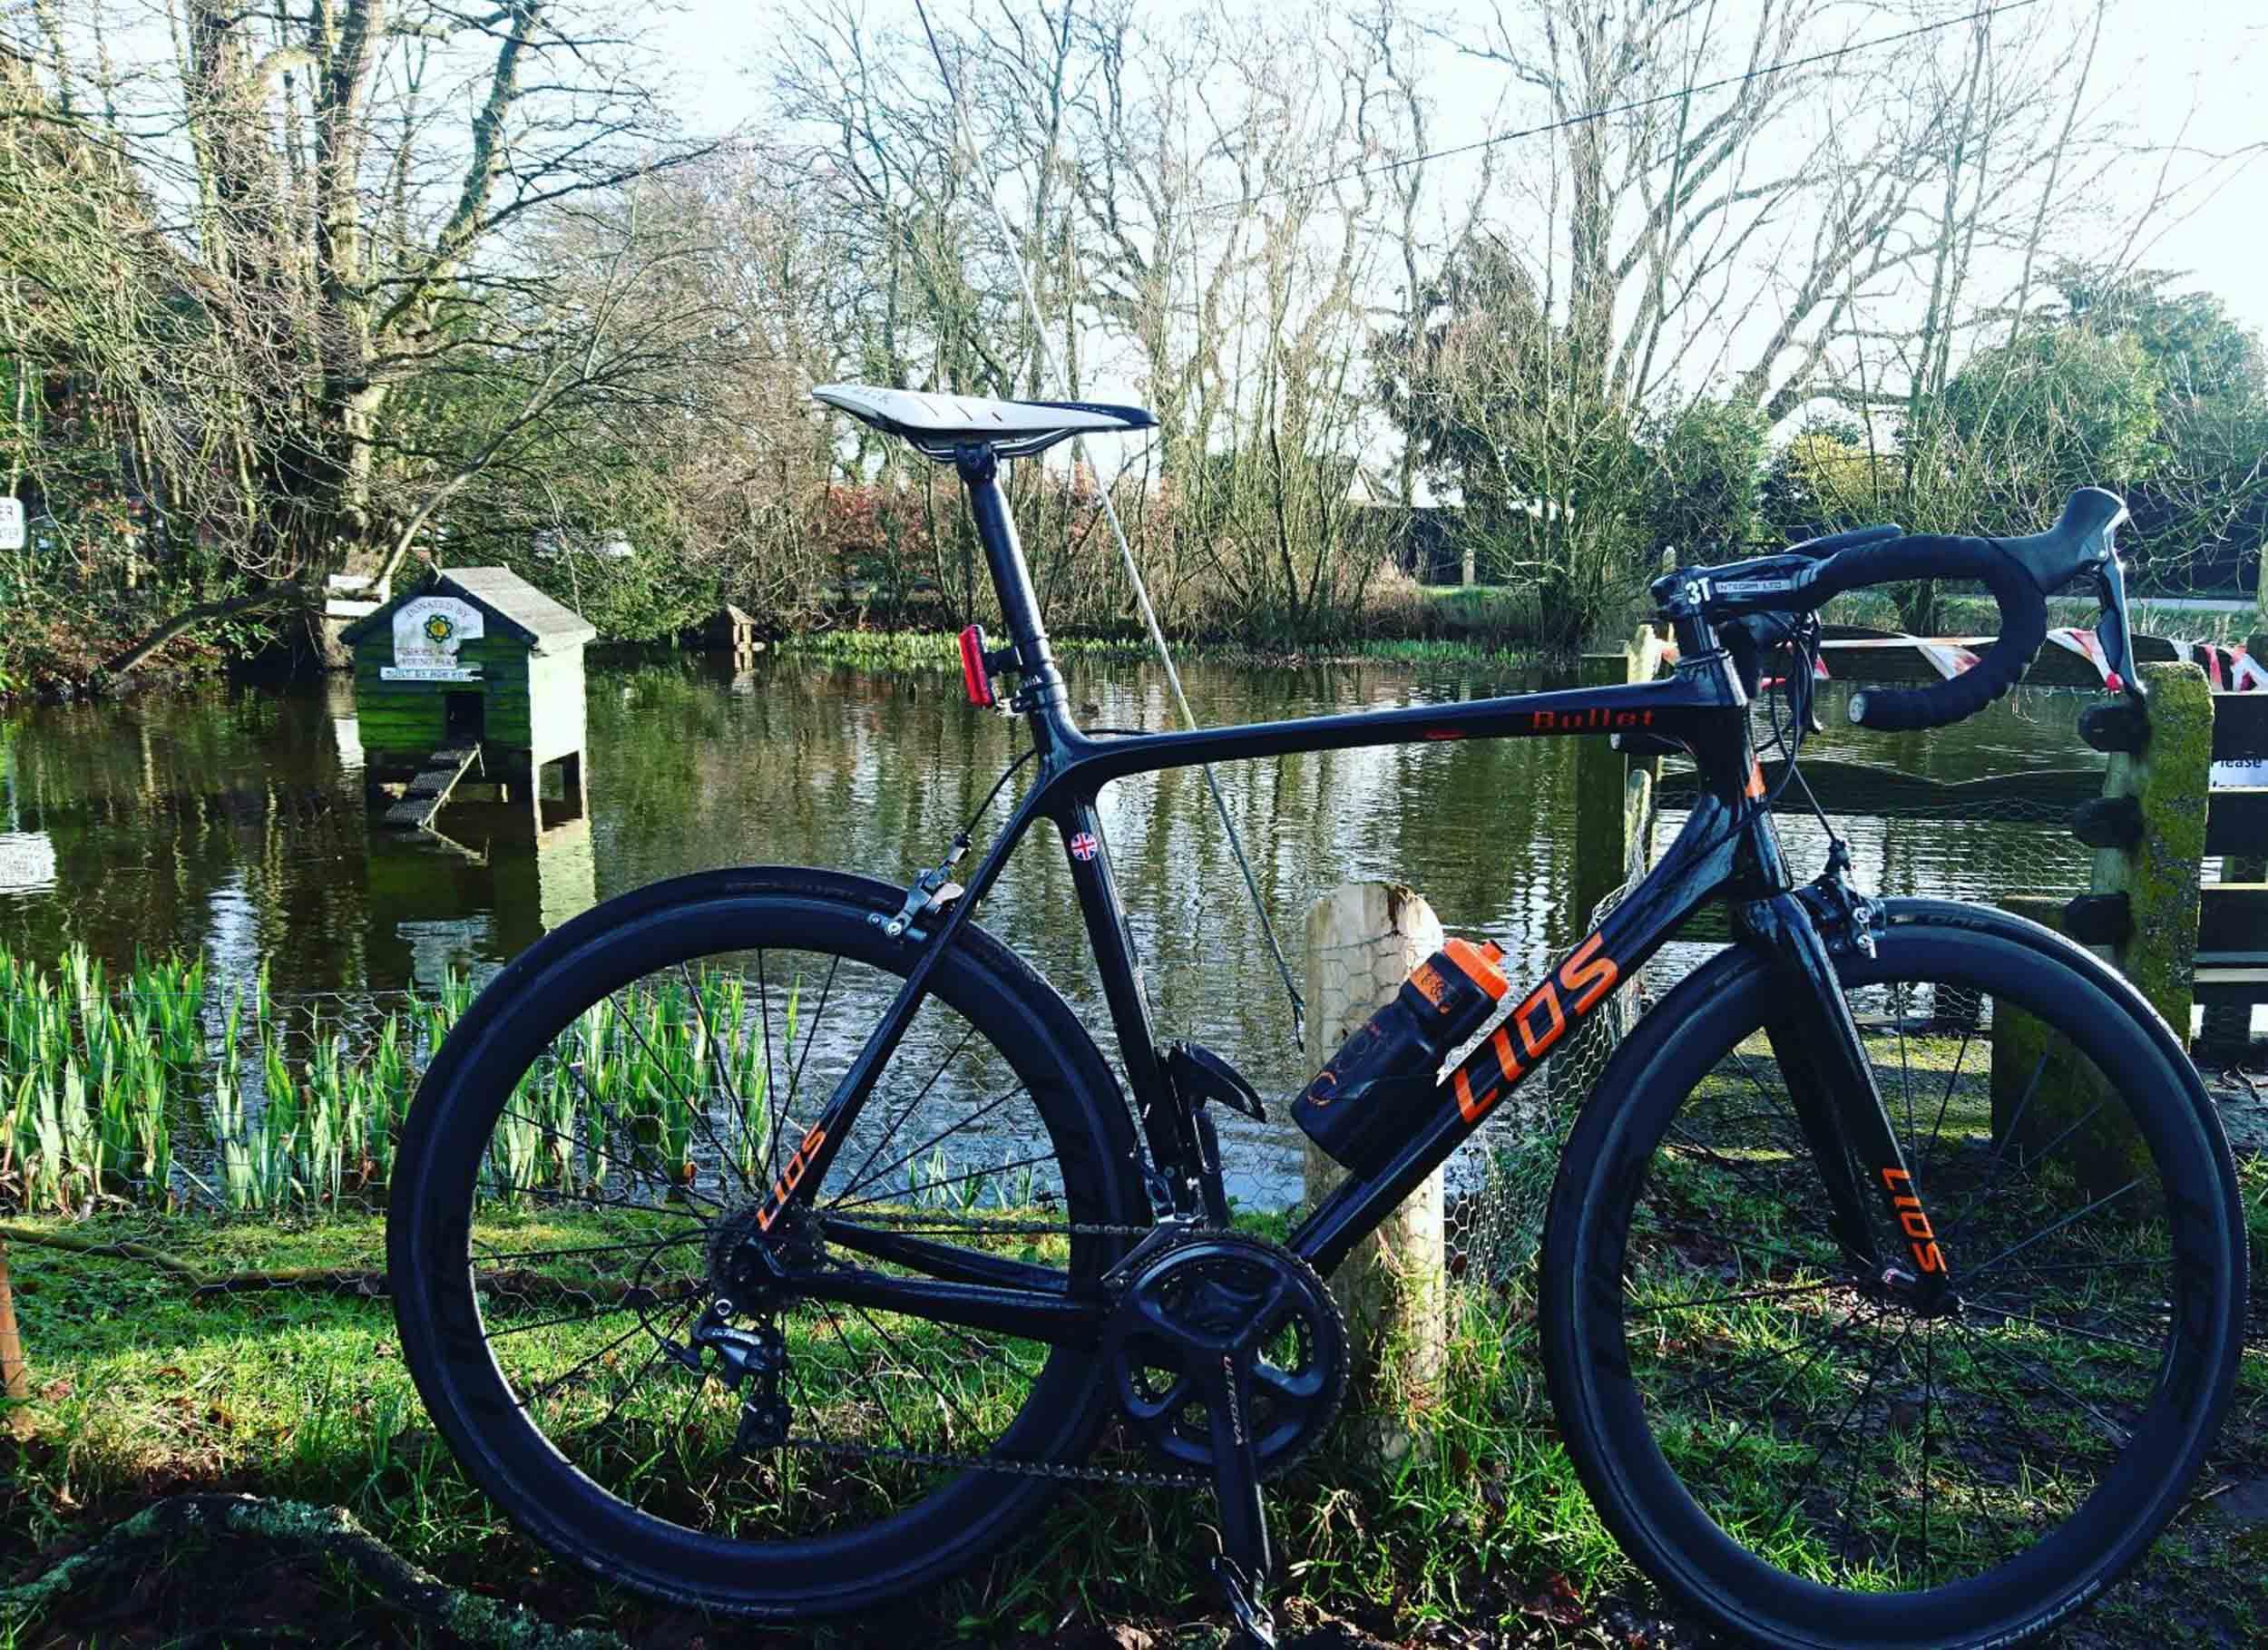 lios-bikes-custom-bike-marc-image-3.jpg